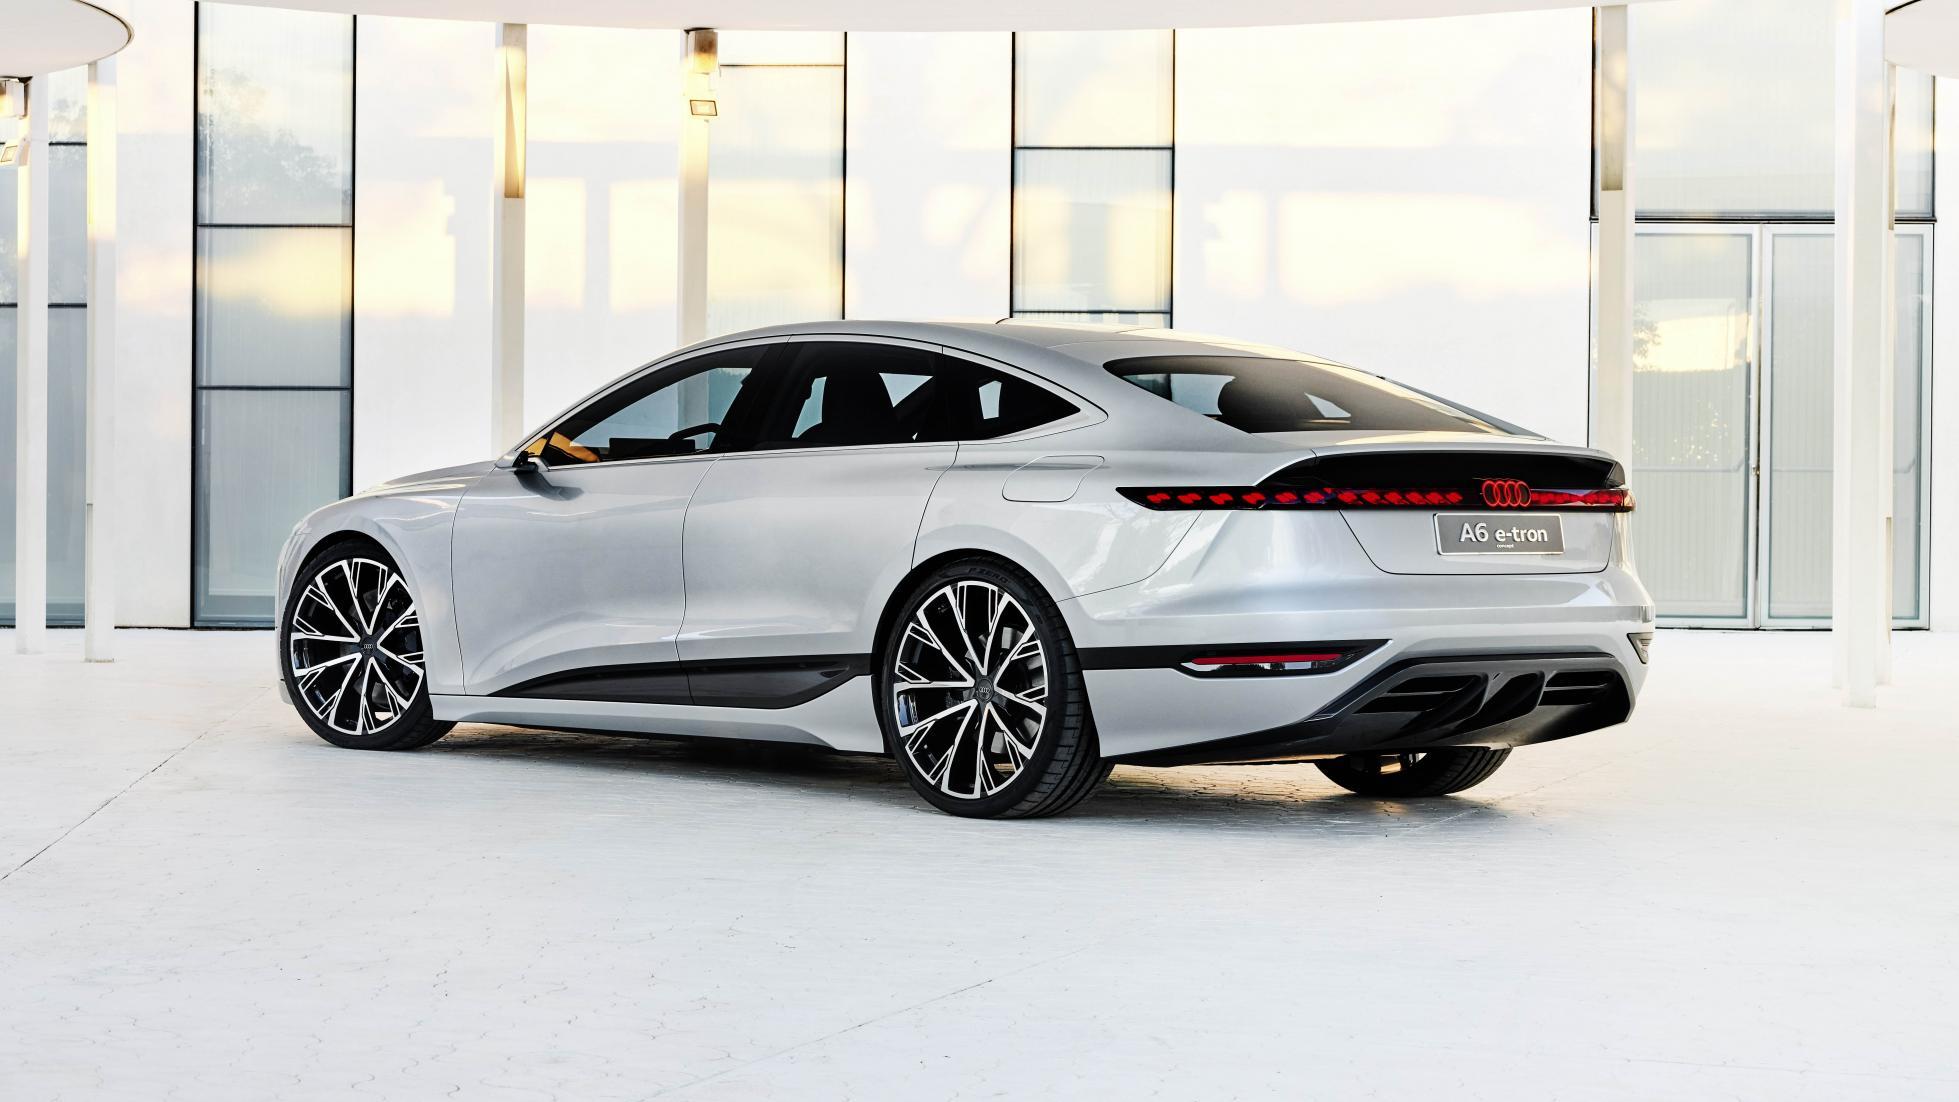 The Audi A6 e-tron concept Rear View Showcase